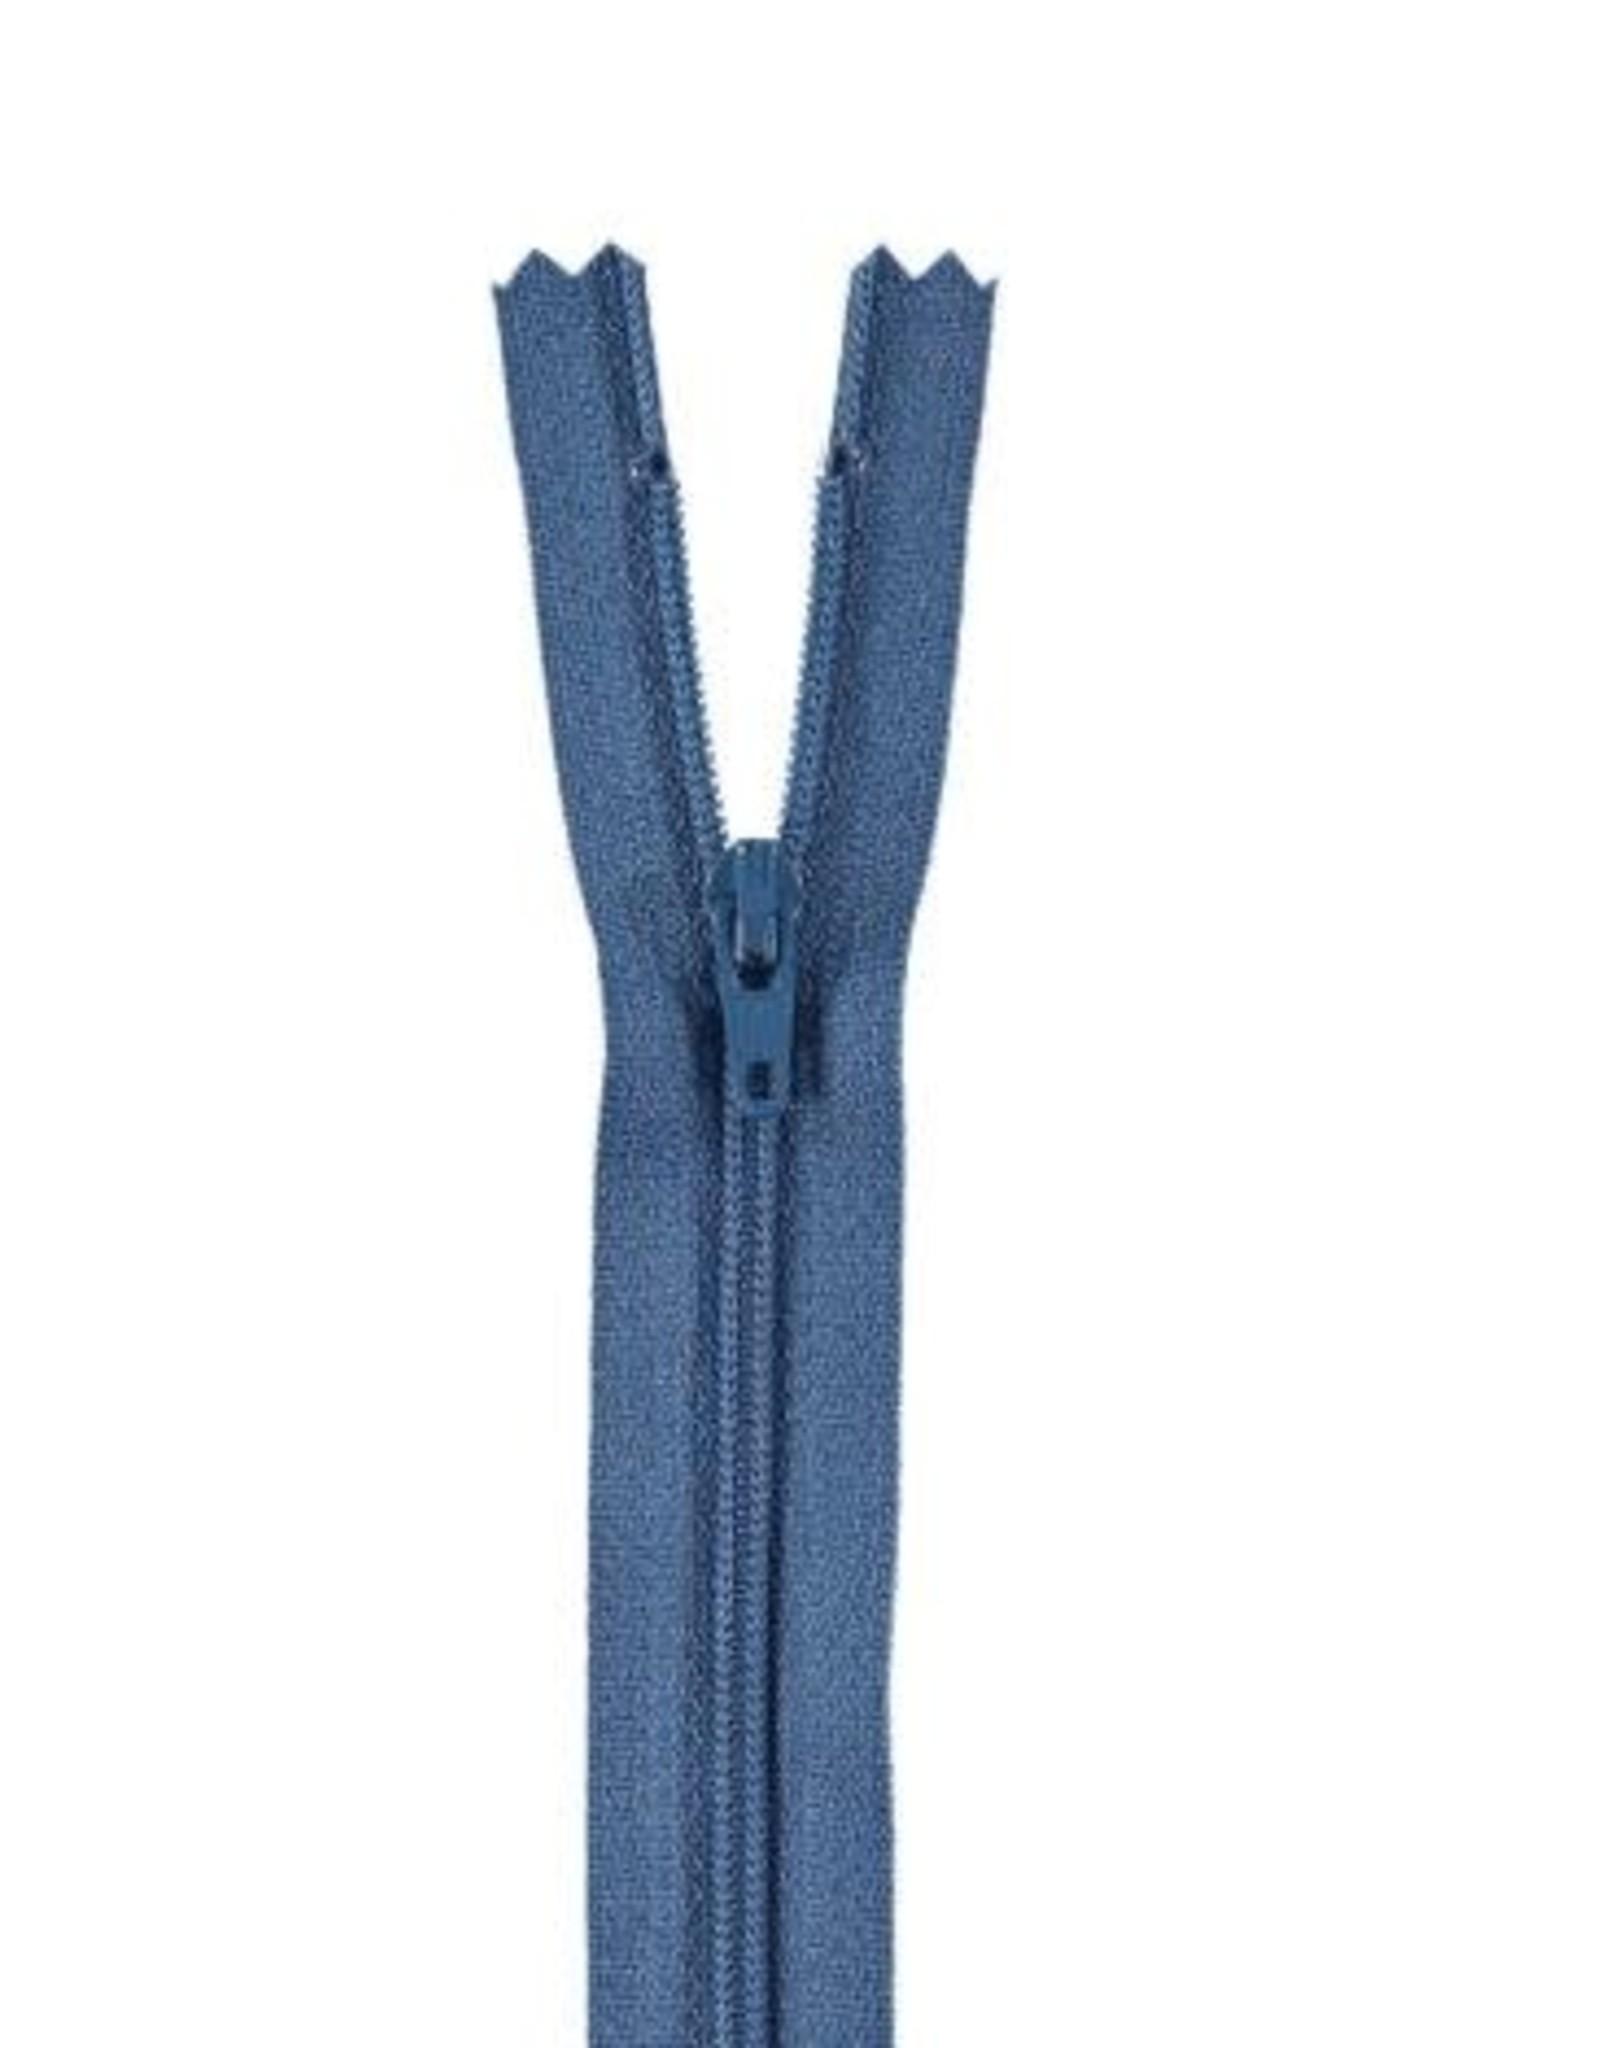 YKK Spiraalrits niet-DB 3mm jeansblauw 839-22cm